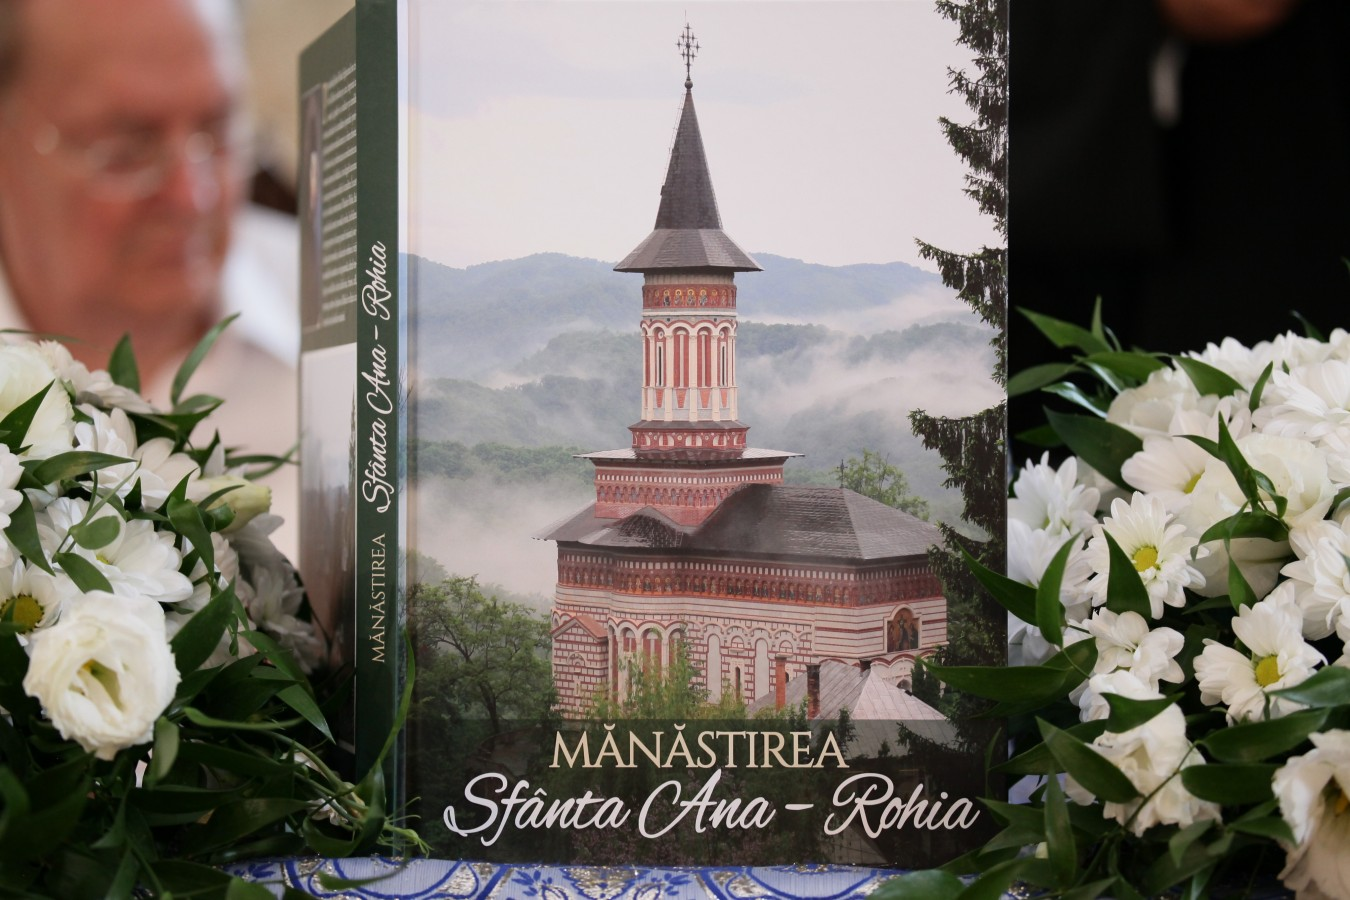 Rohia, 90 de ani de viaţă monahală (1926-2016)